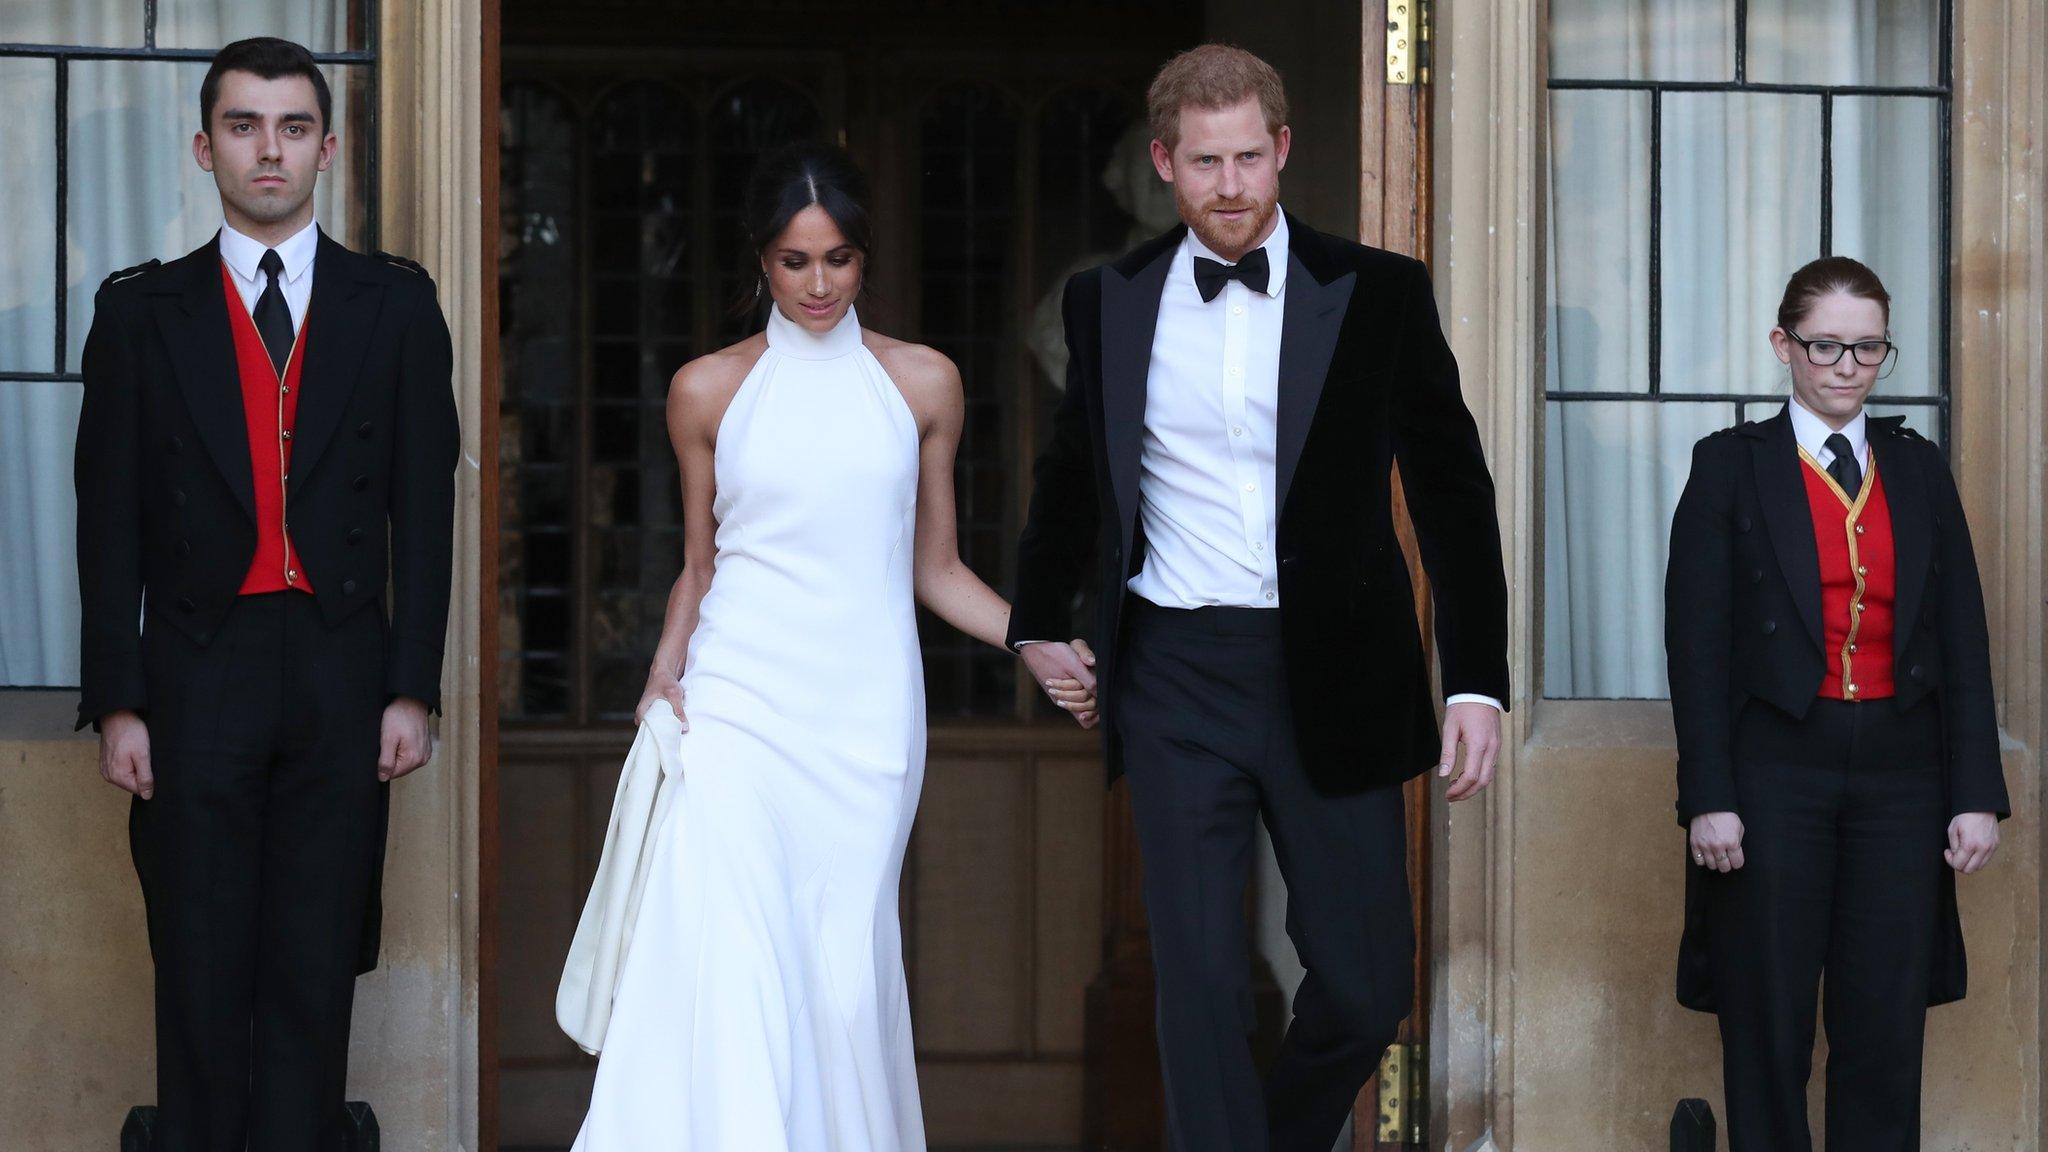 Royal wedding 2018: Couple leave Windsor after wedding